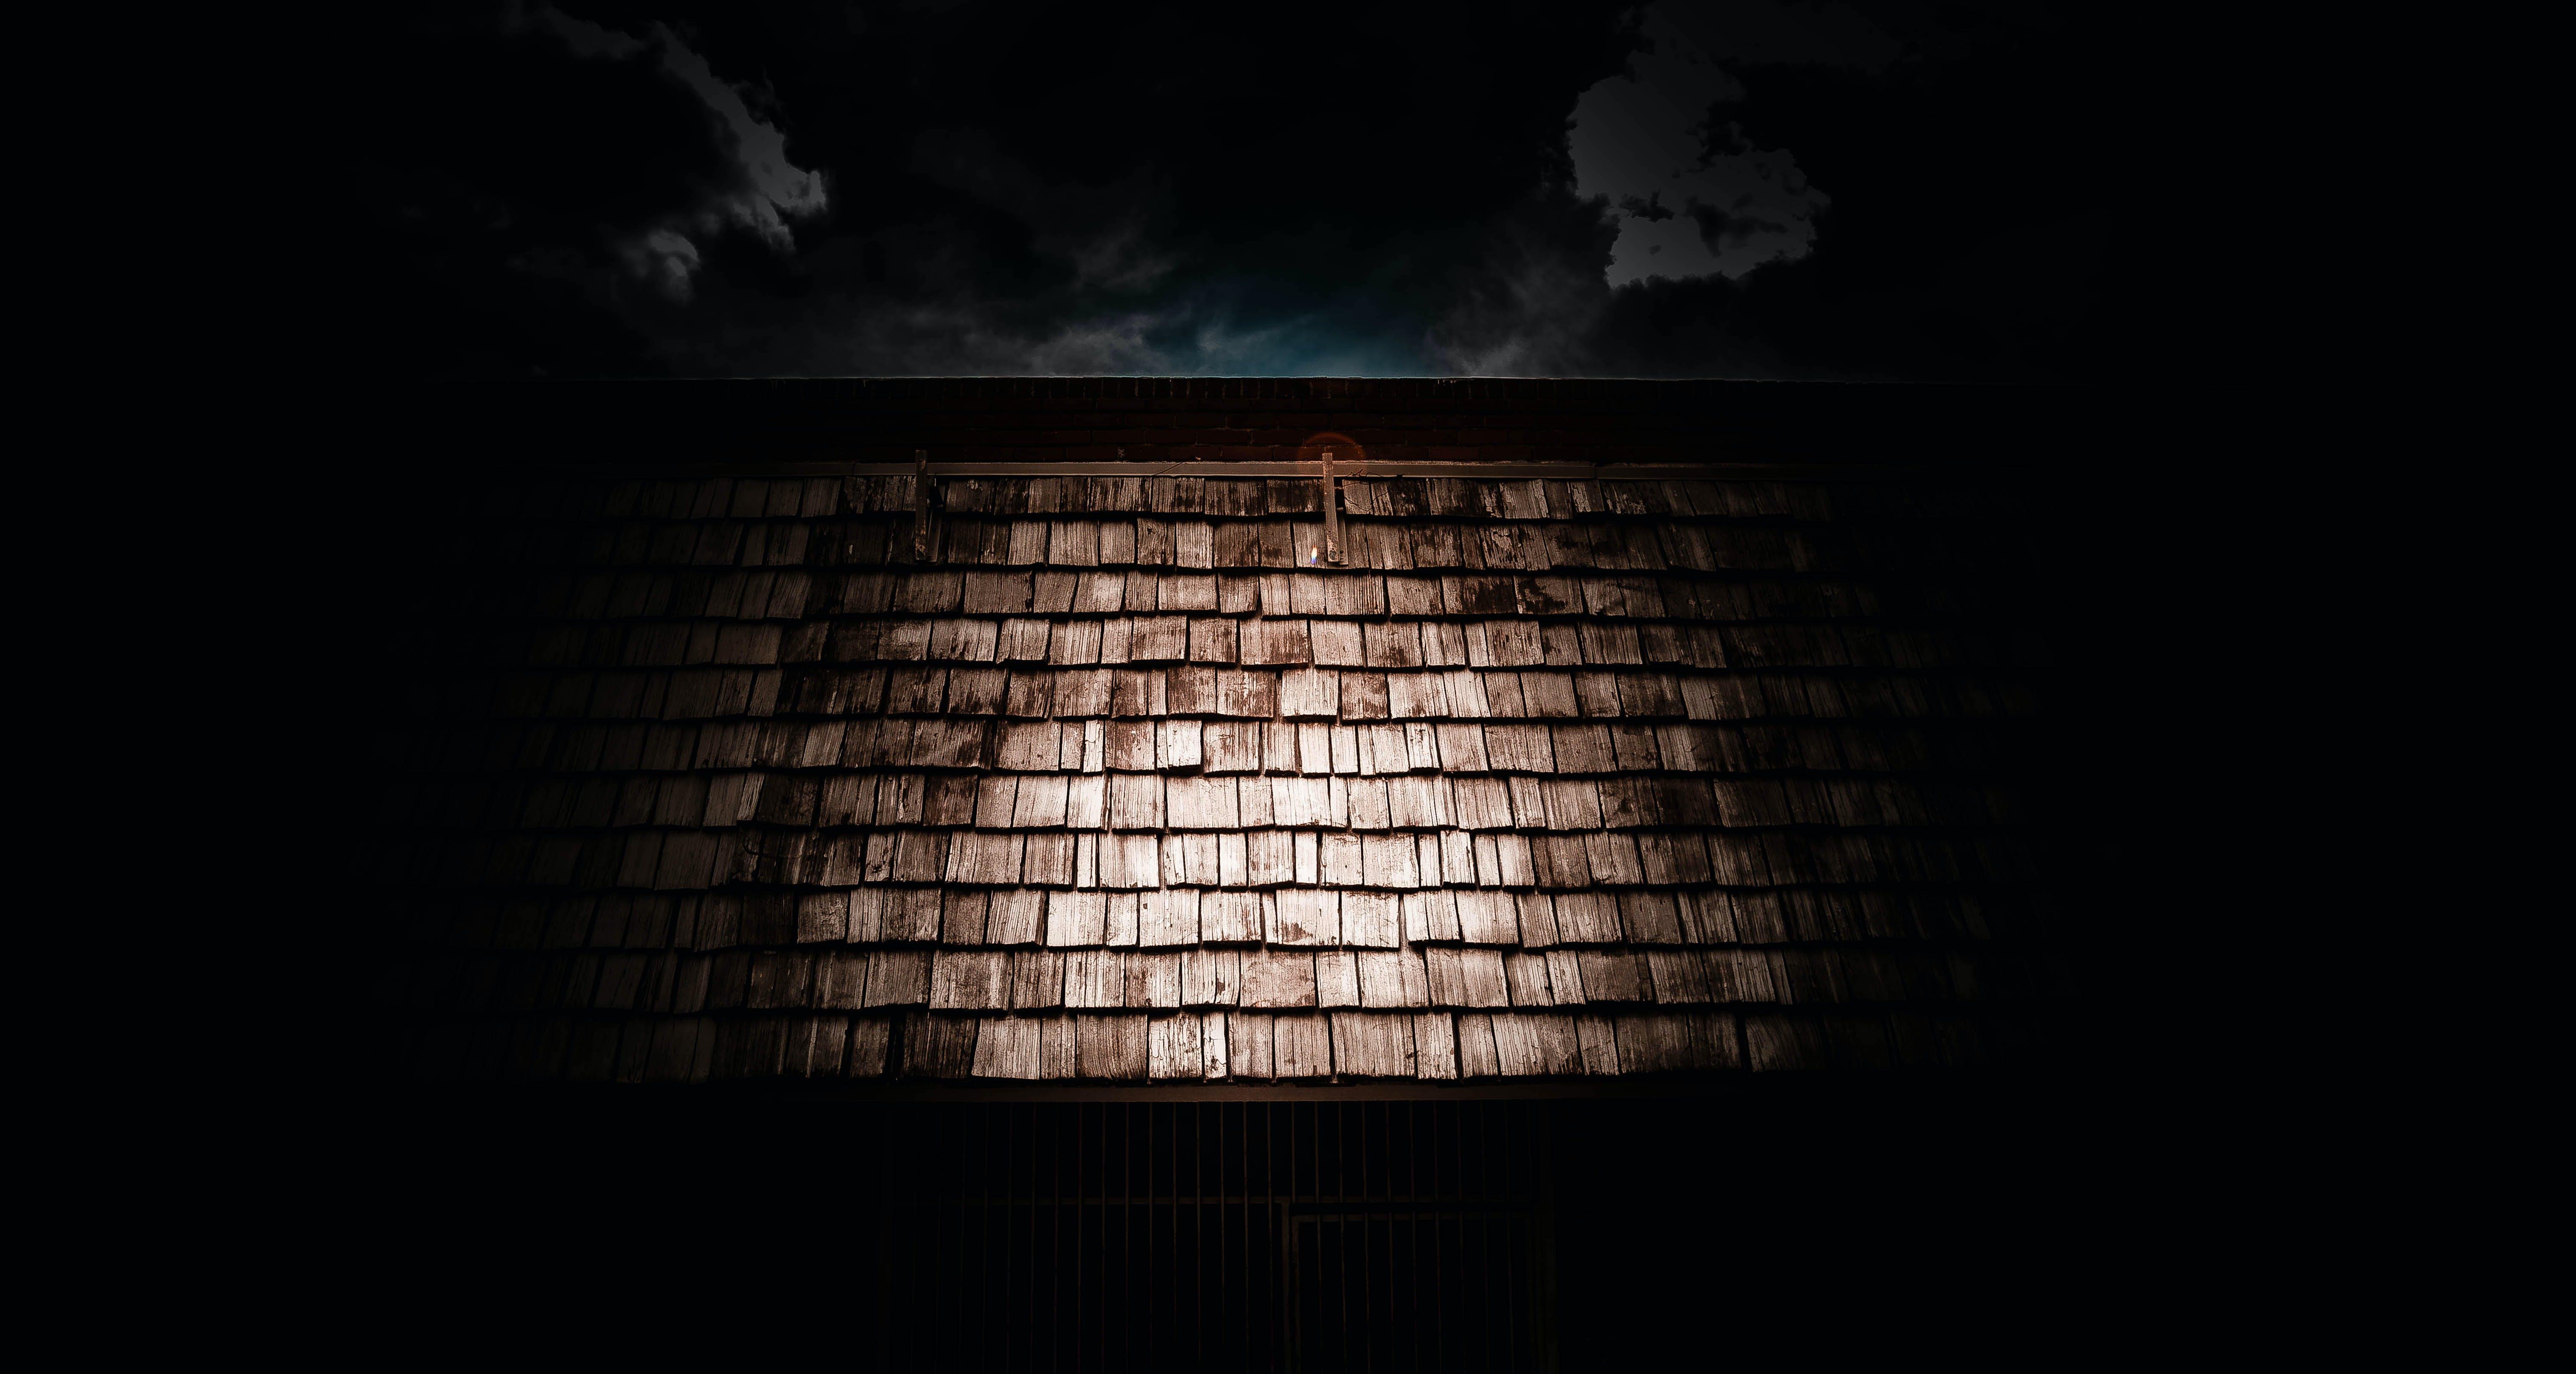 Free stock photo of city at night, creepy, dark, halloween